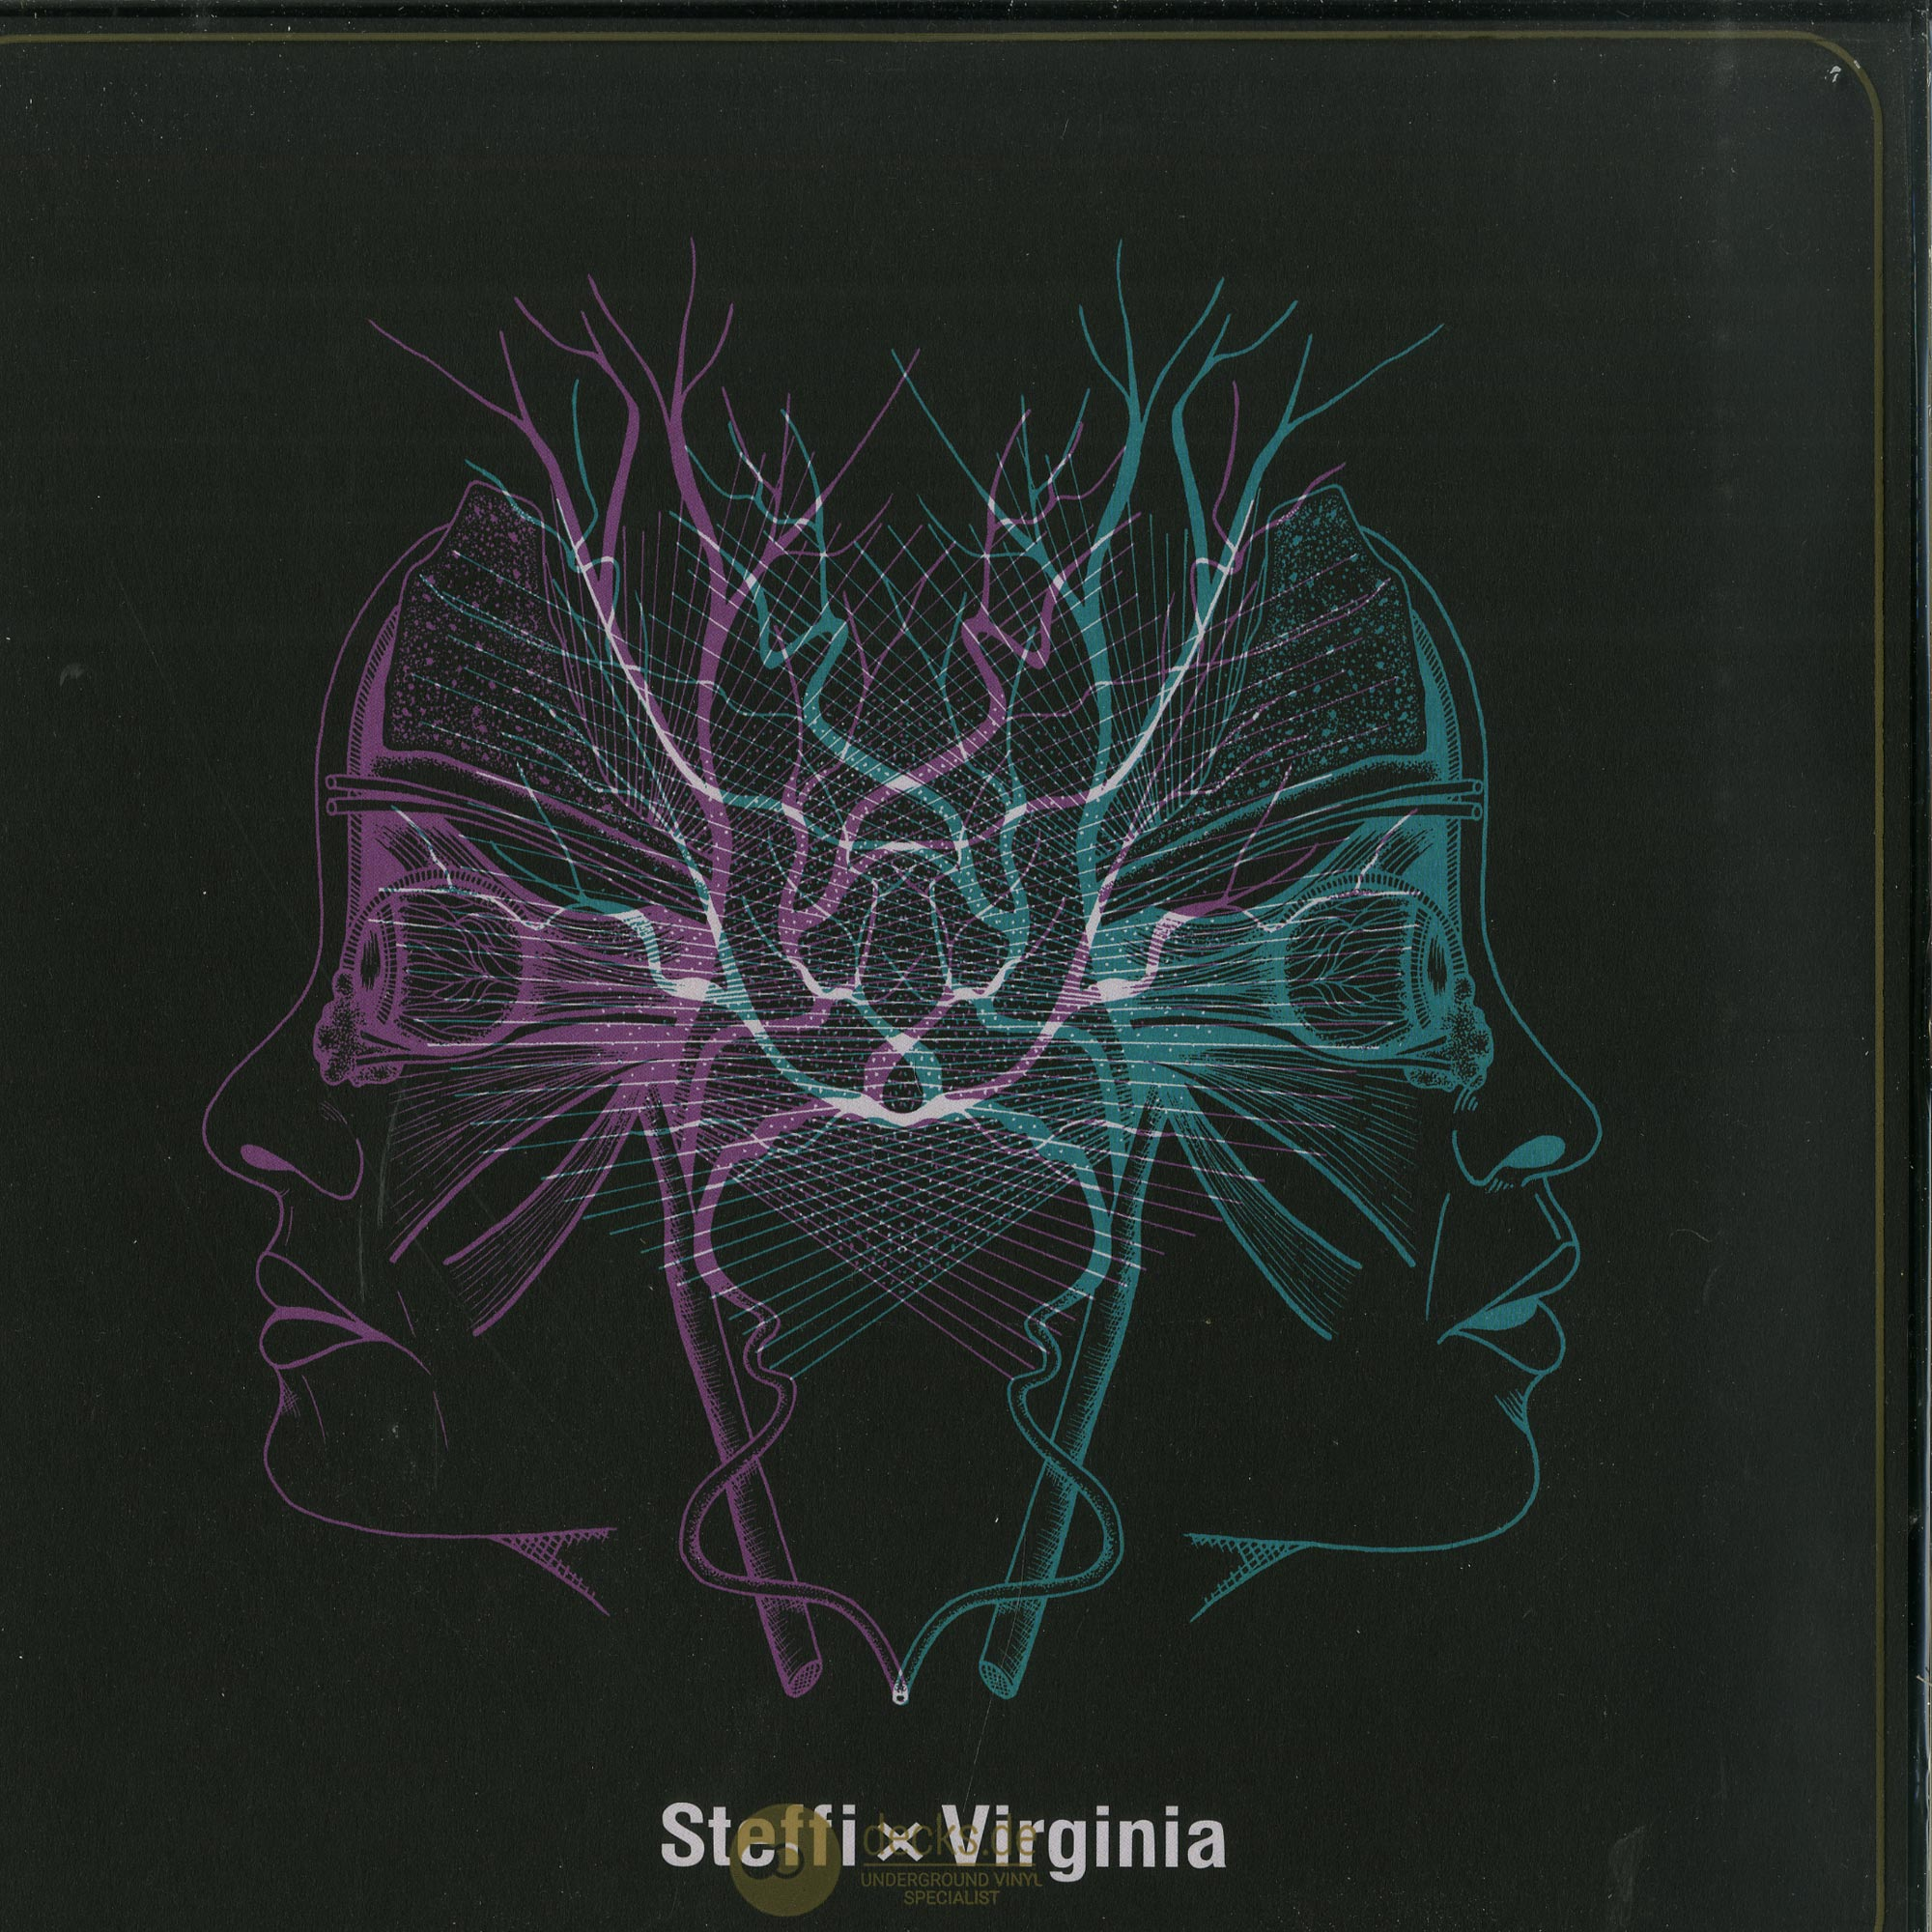 Steffi x Virginia - WORK A CHANGE